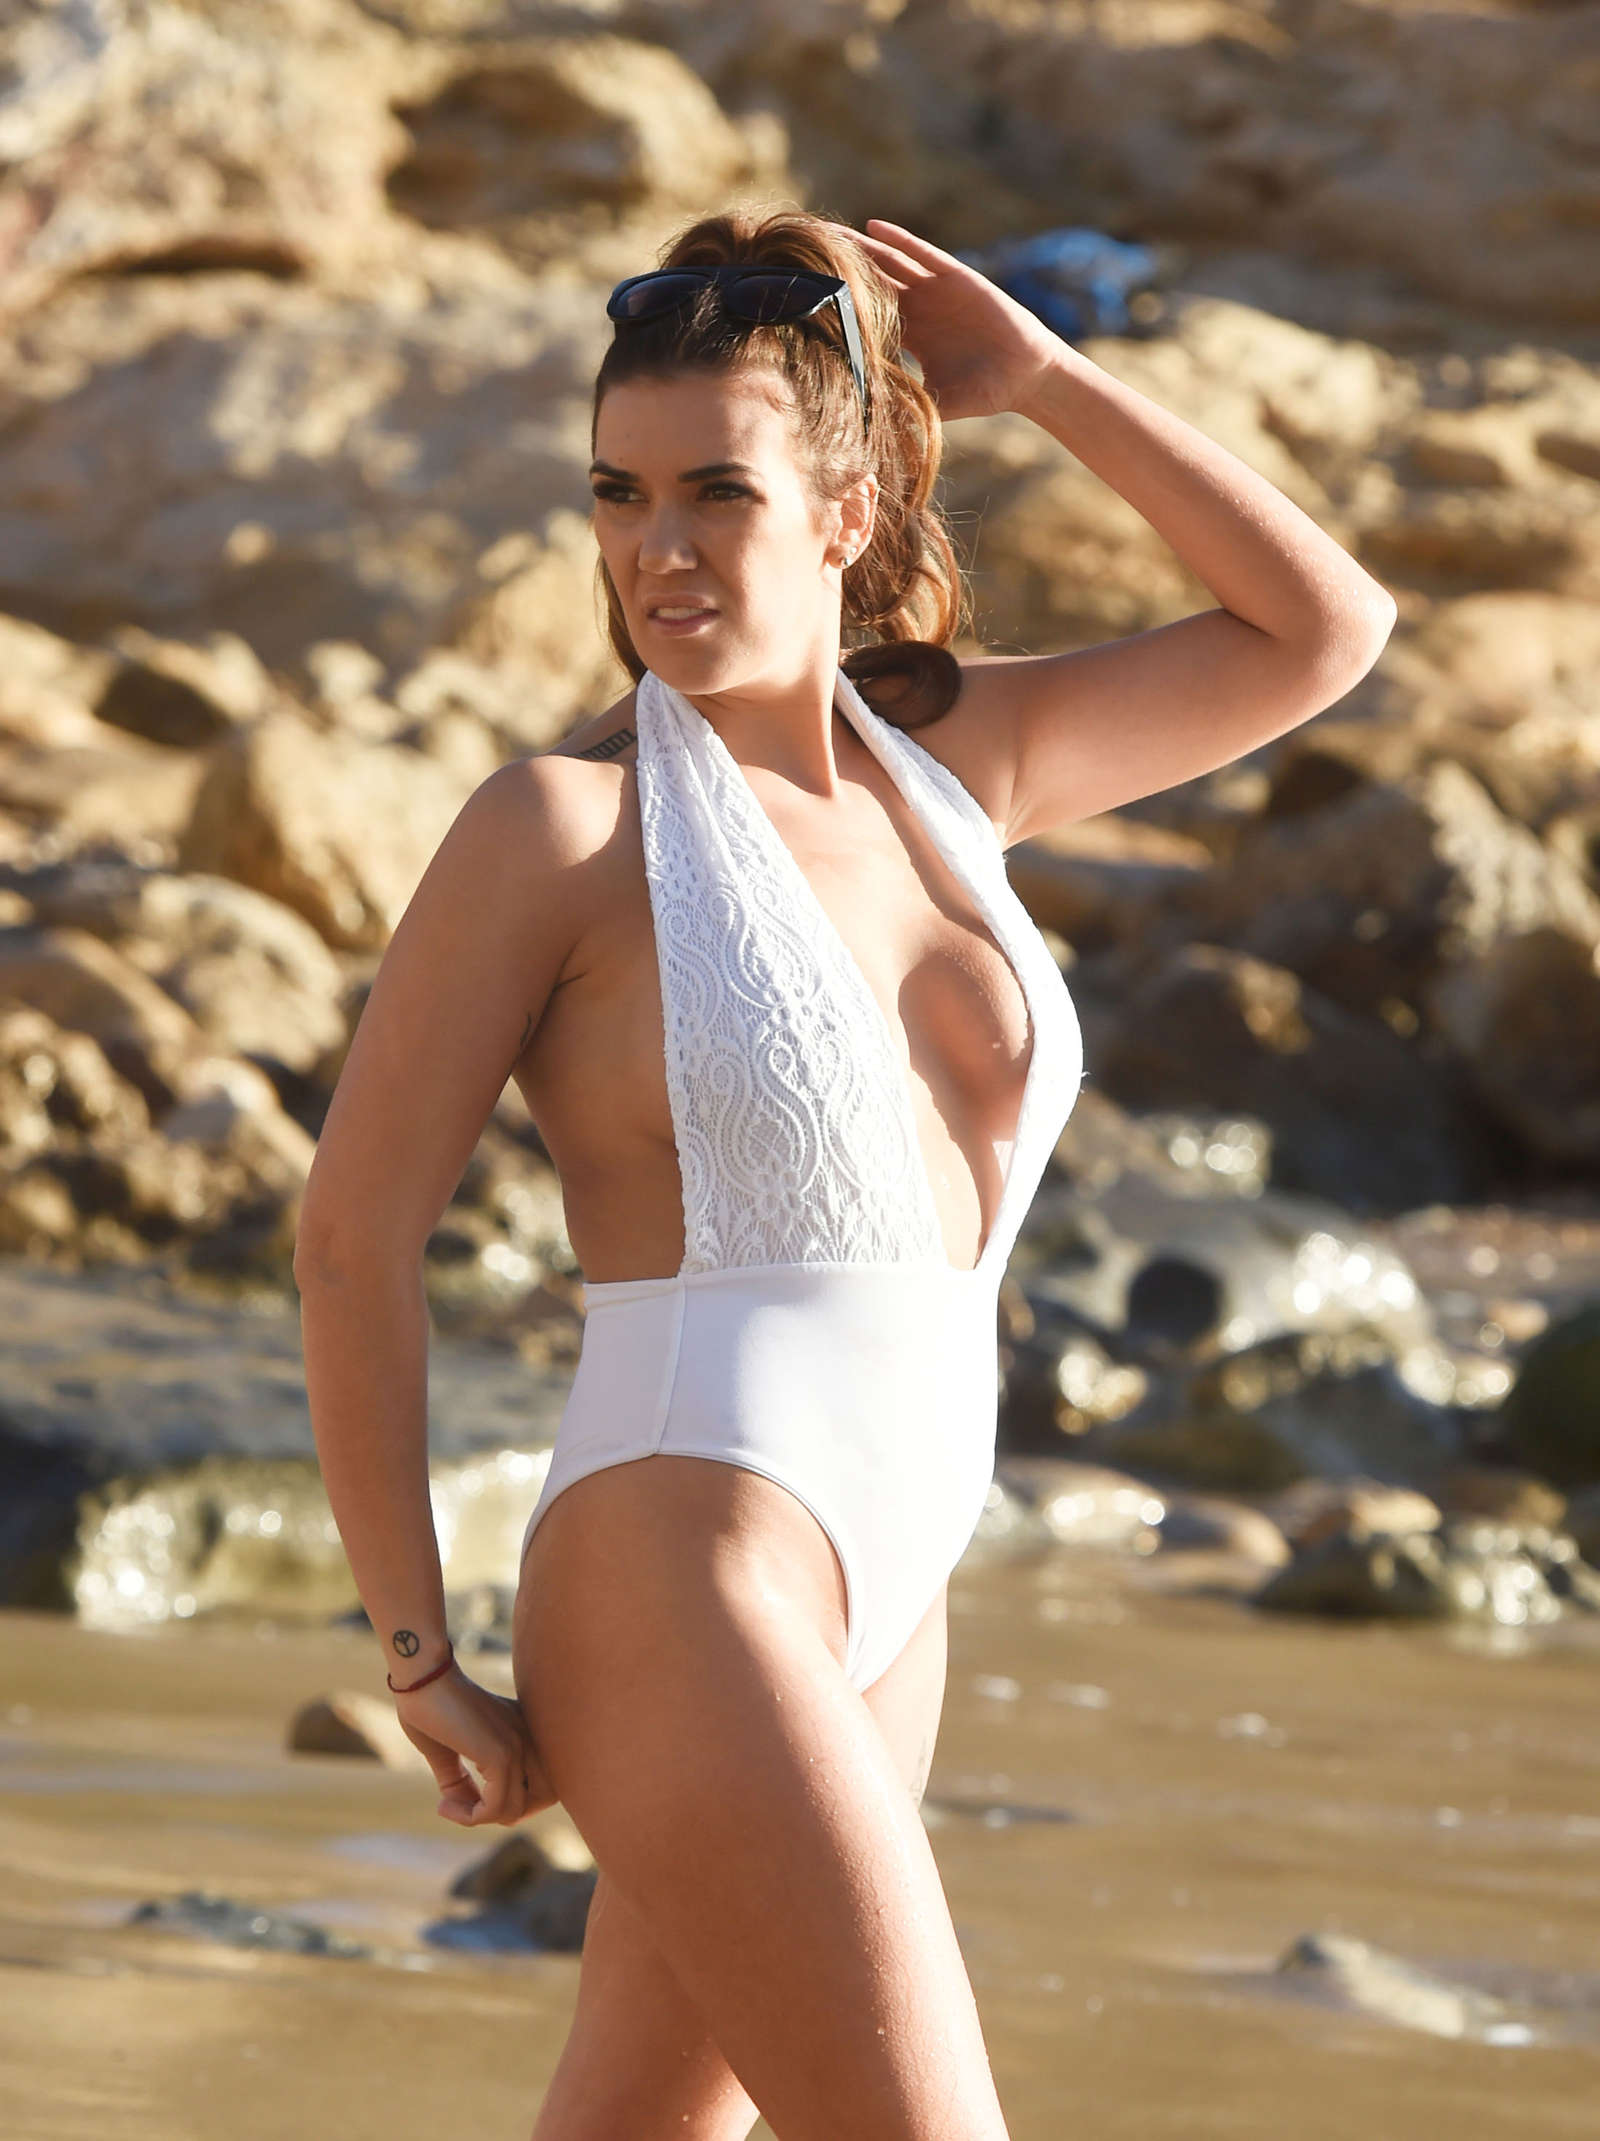 Imogen Townley nude (94 photo), video Boobs, iCloud, cameltoe 2020